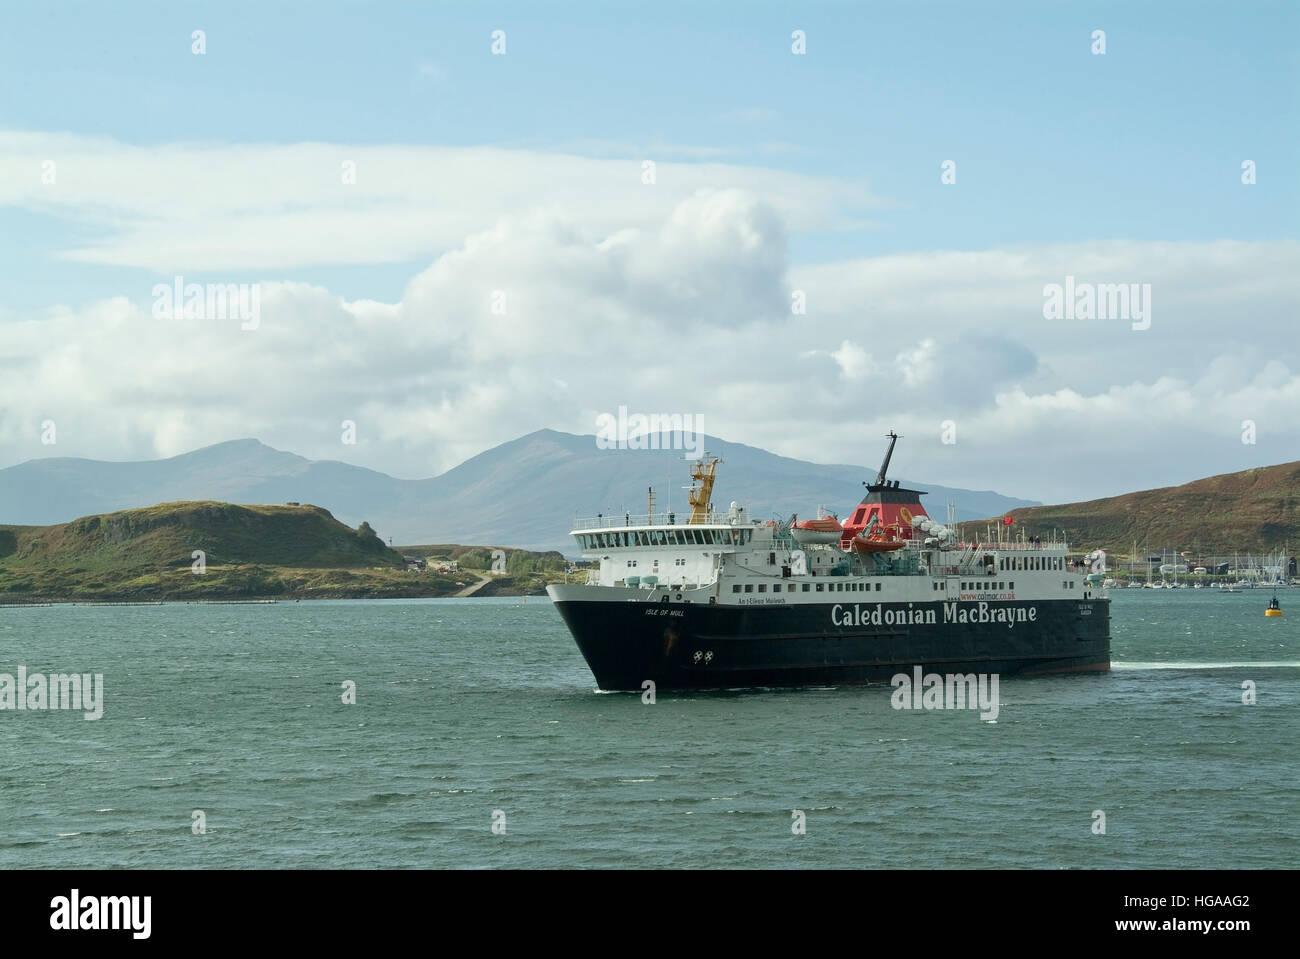 Calmac ferry isle of Mull in Oban Bay. - Stock Image